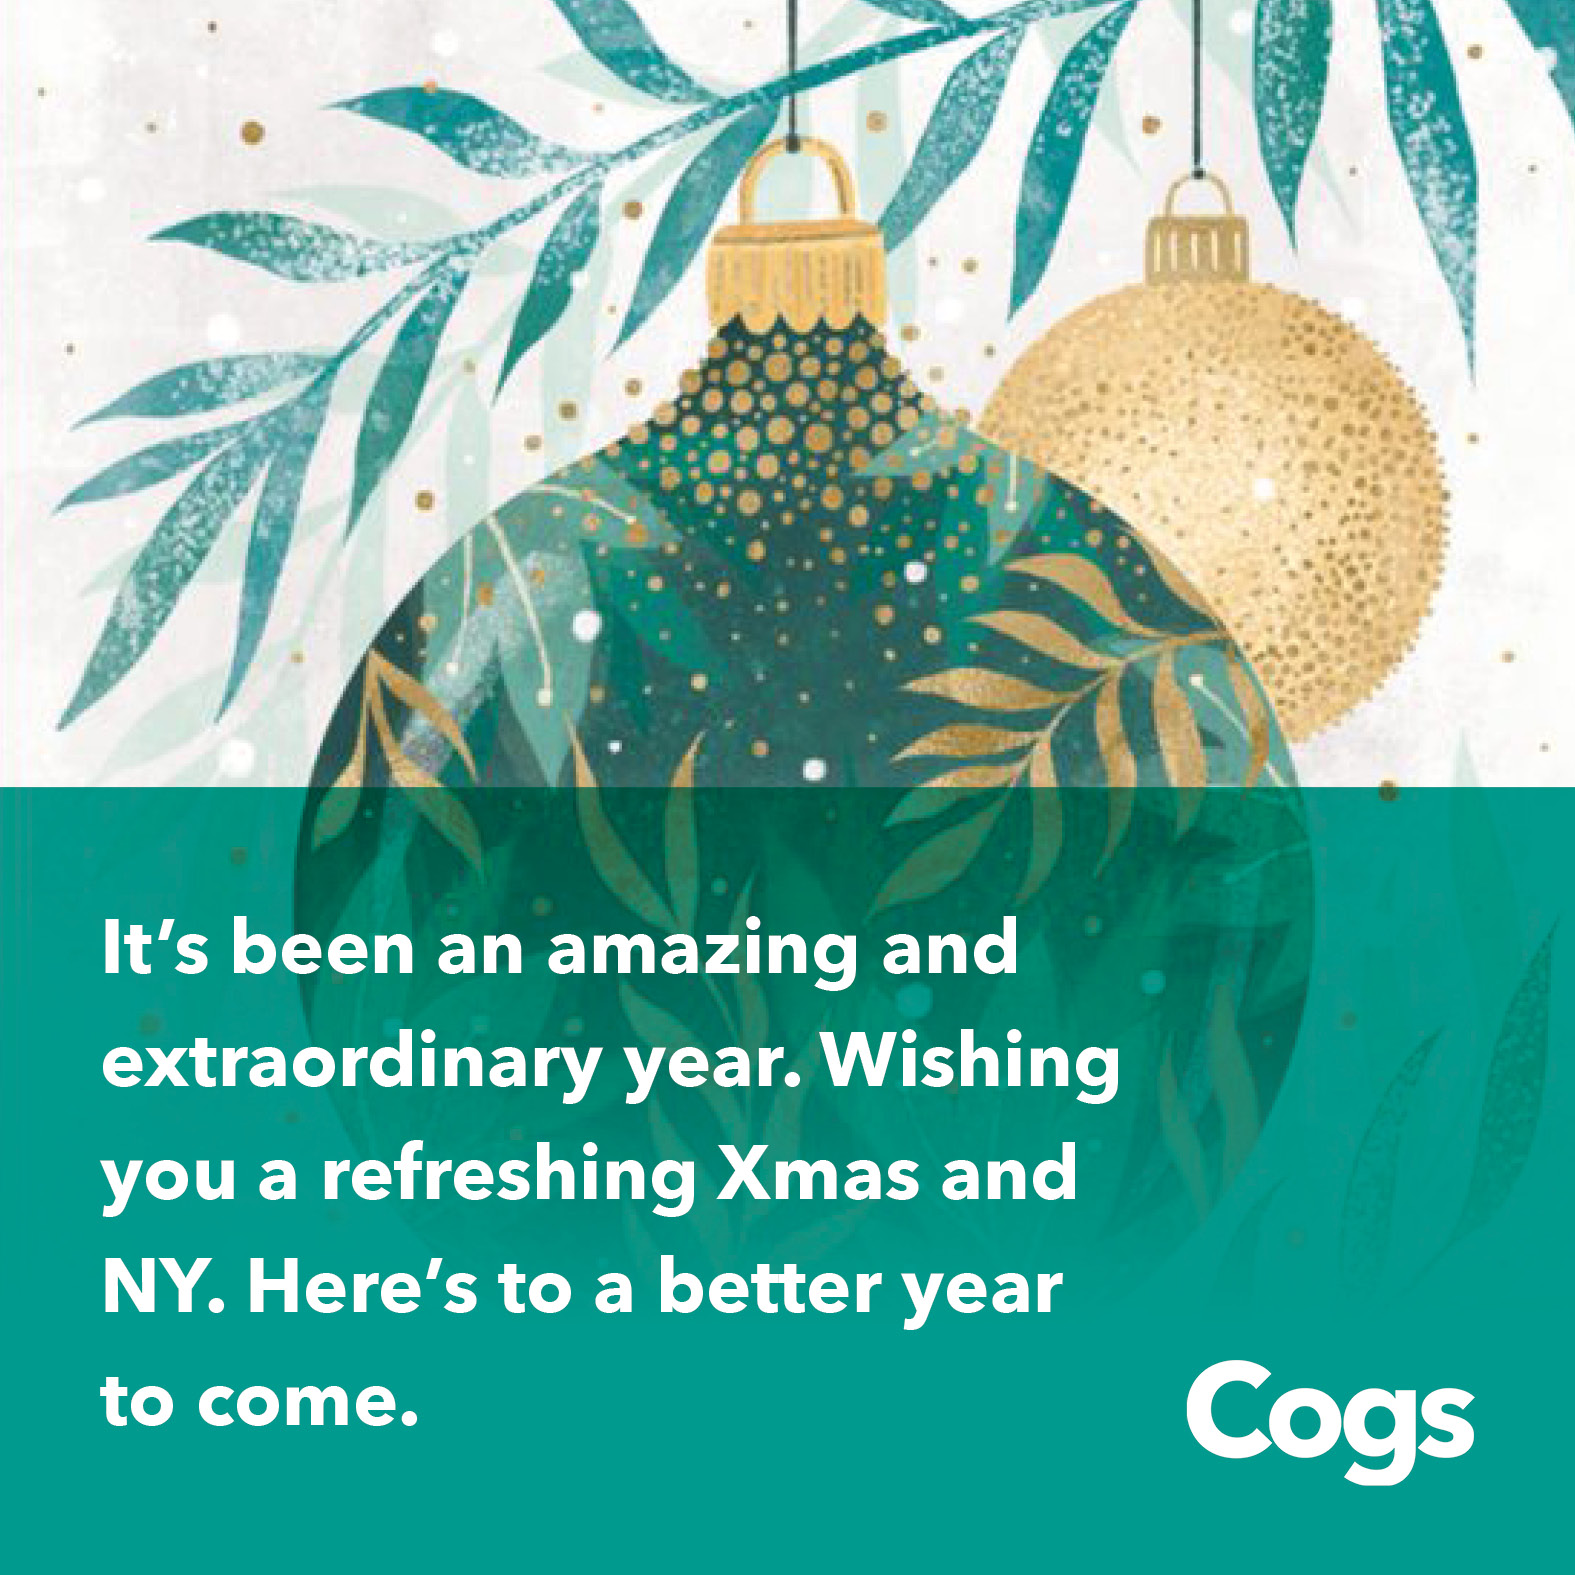 Cogs - Happy Holidays - Instagram3